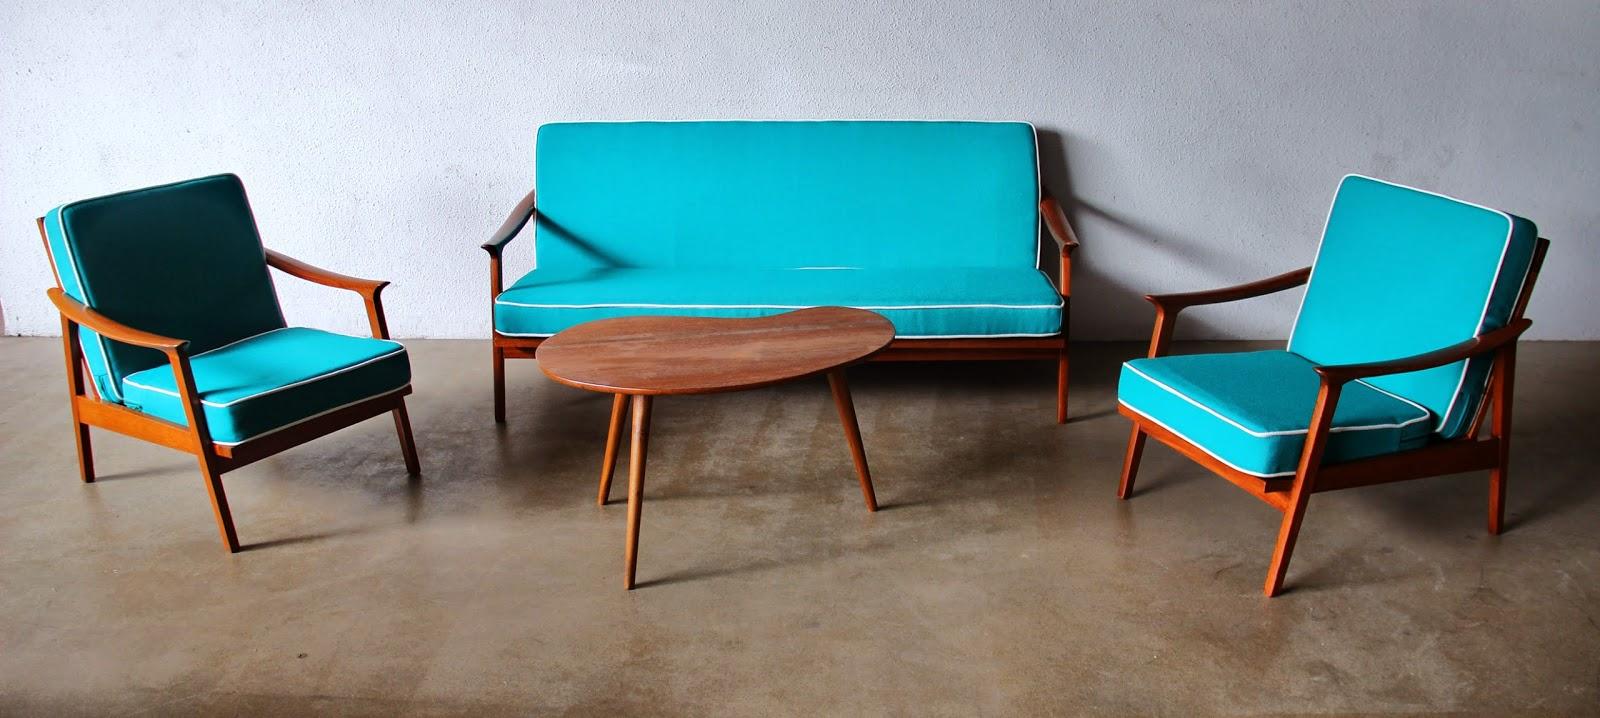 Vintage Love Furniture Red And Reupholstered